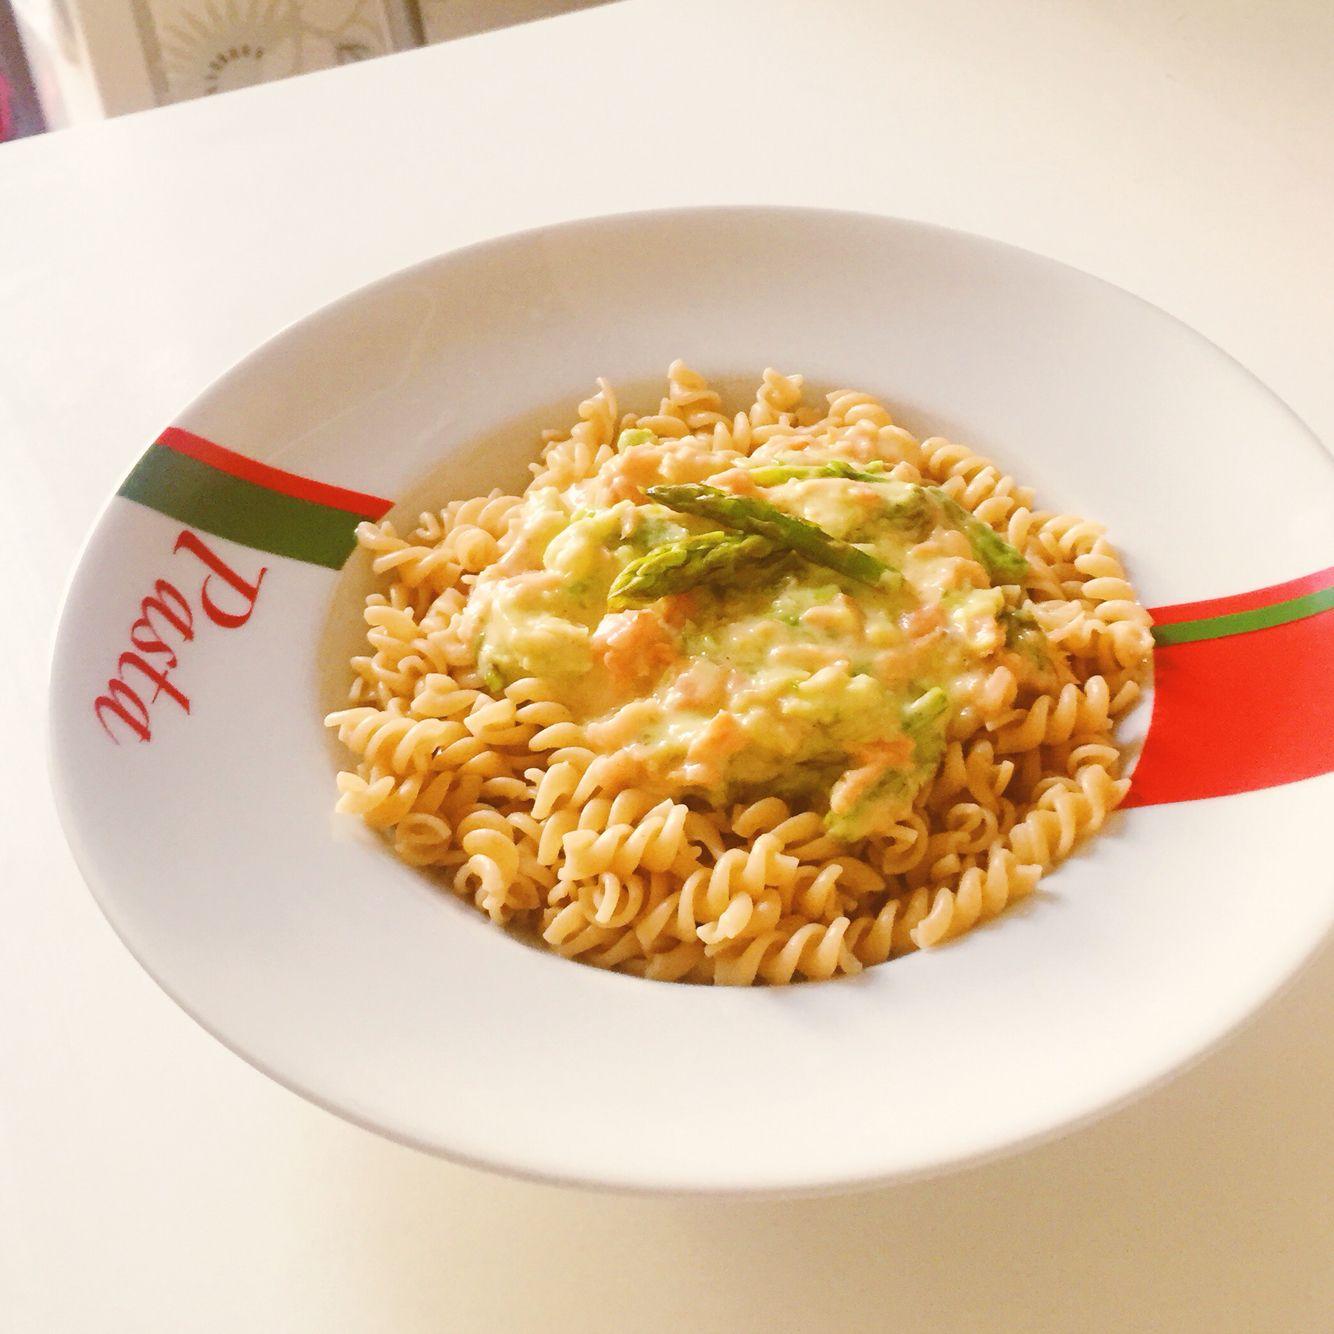 7min recipe while cooking pasta fry big chuncks of asparagus 7min recipe while cooking pasta fry big chuncks of asparagus add cream ccuart Image collections